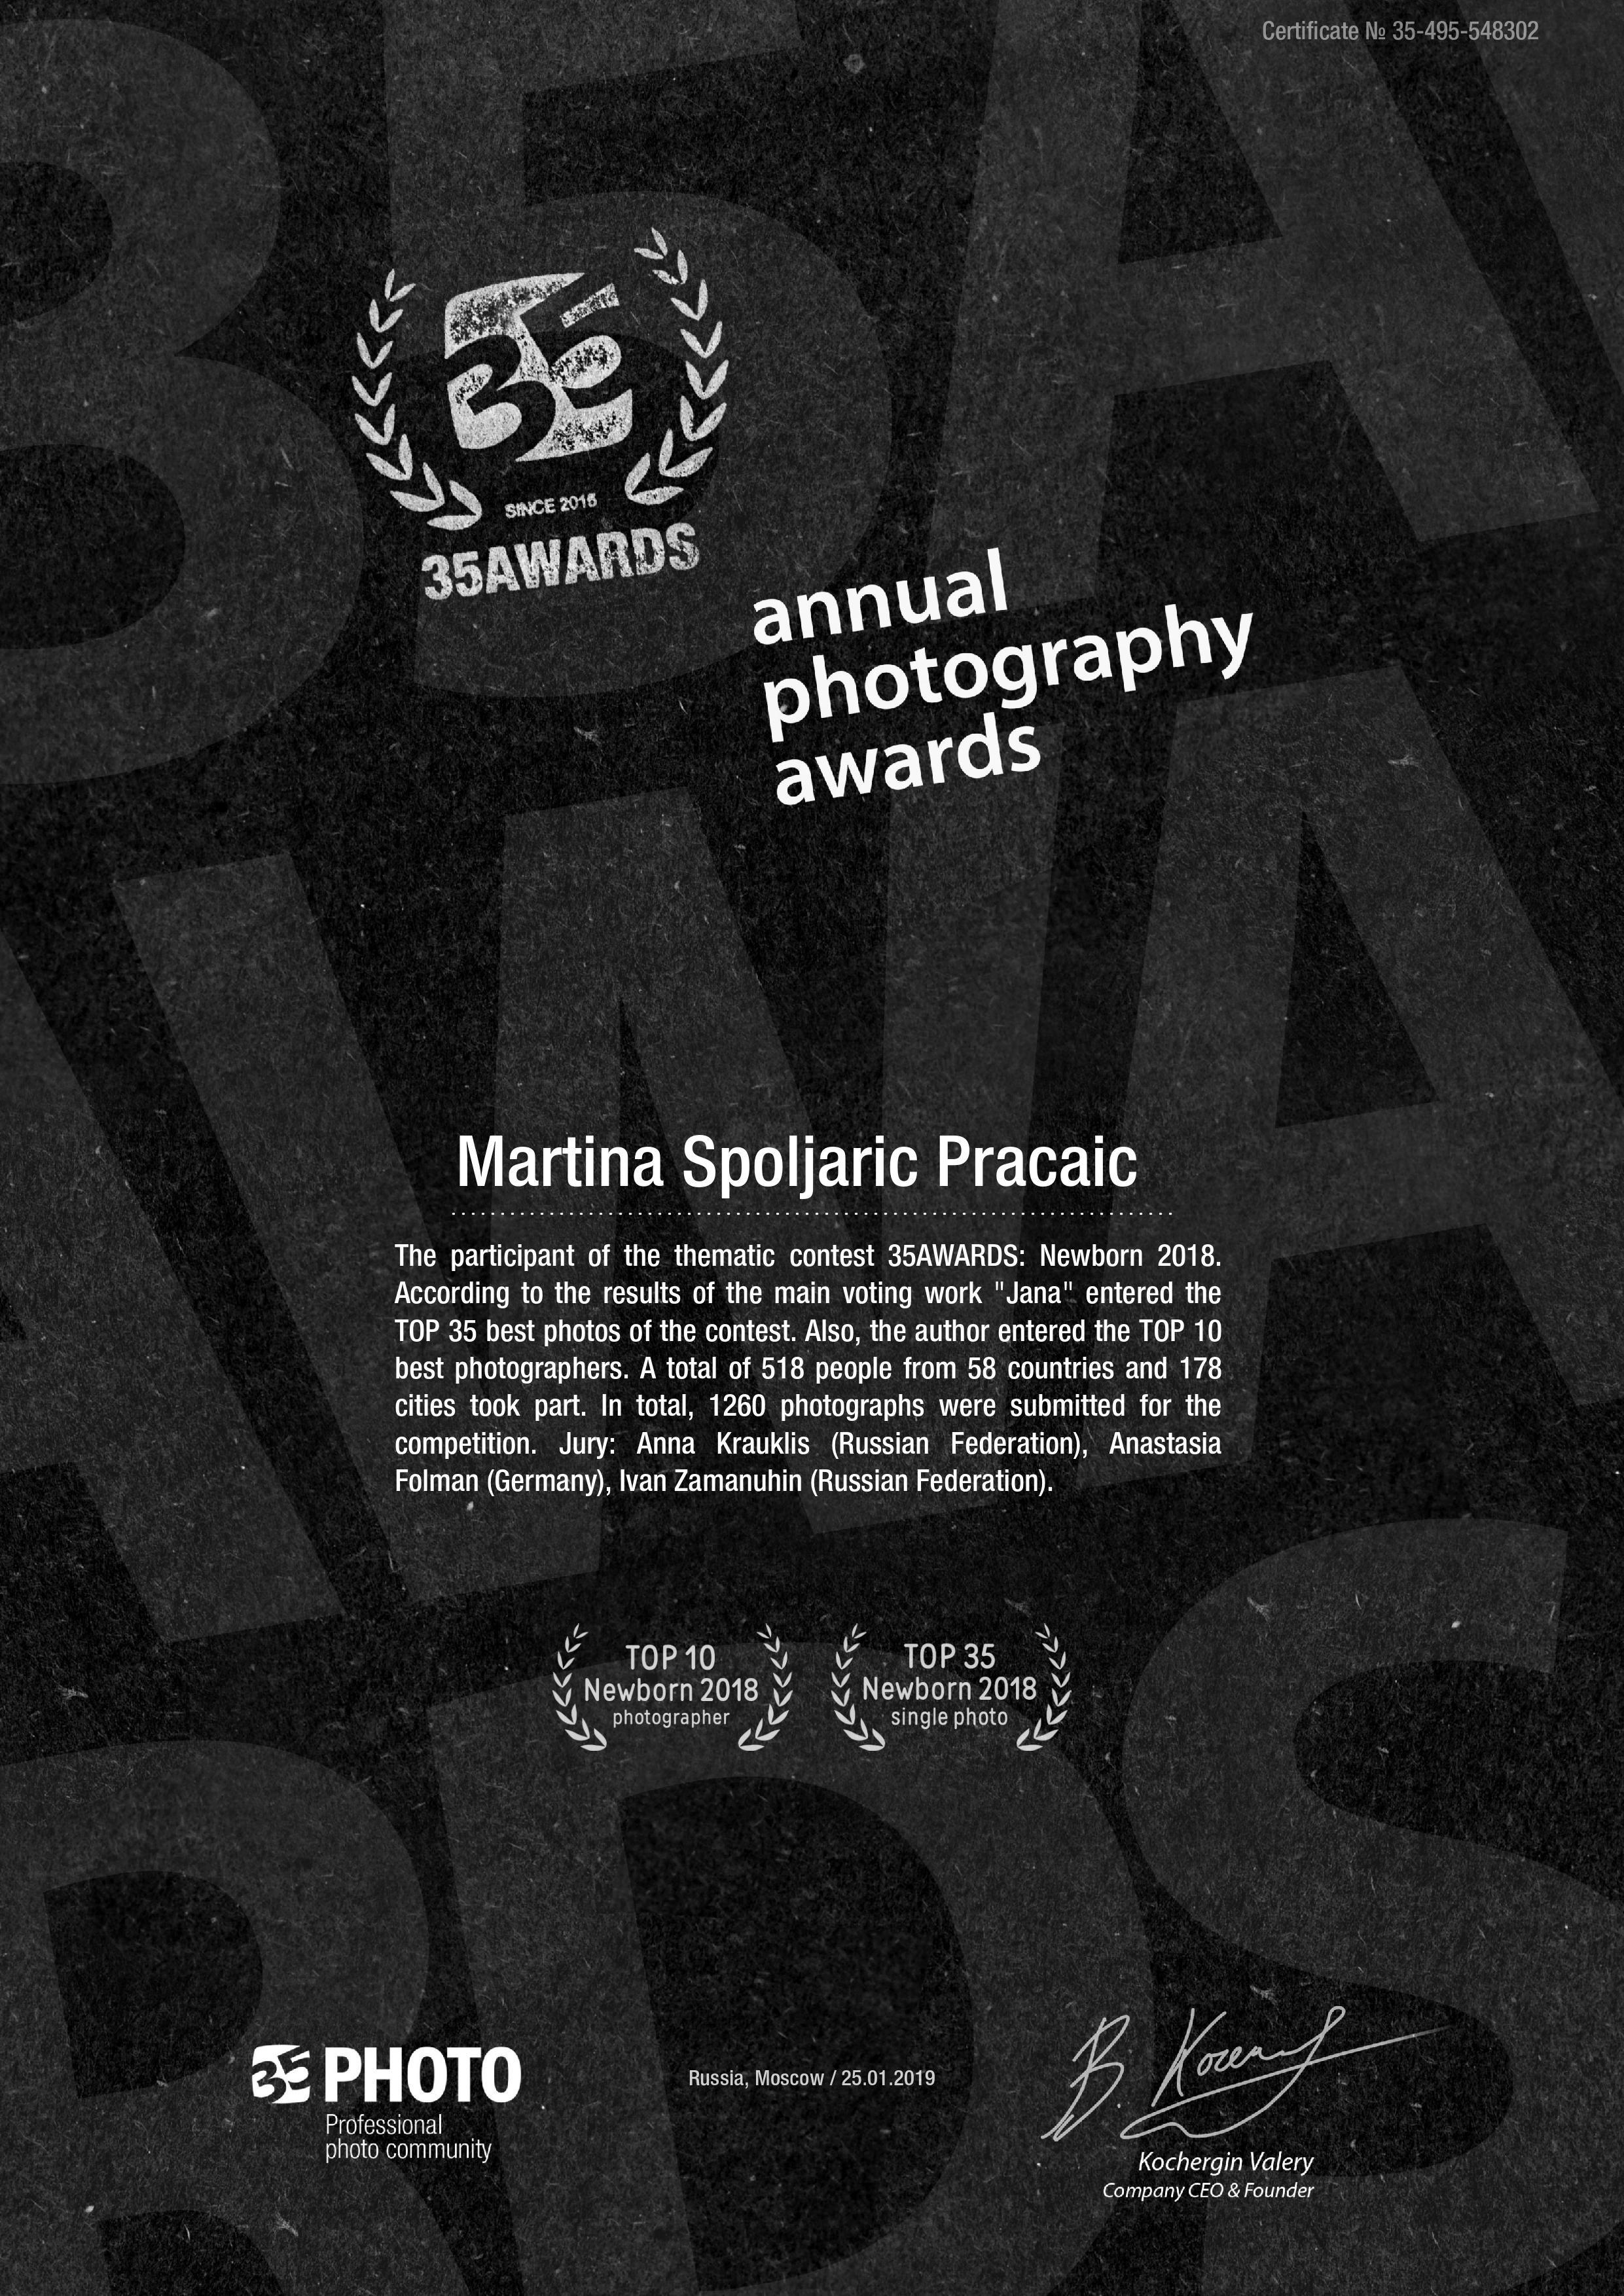 INTERNATIONAL AWARD WINNING PHOTOGRAPHER 2018.